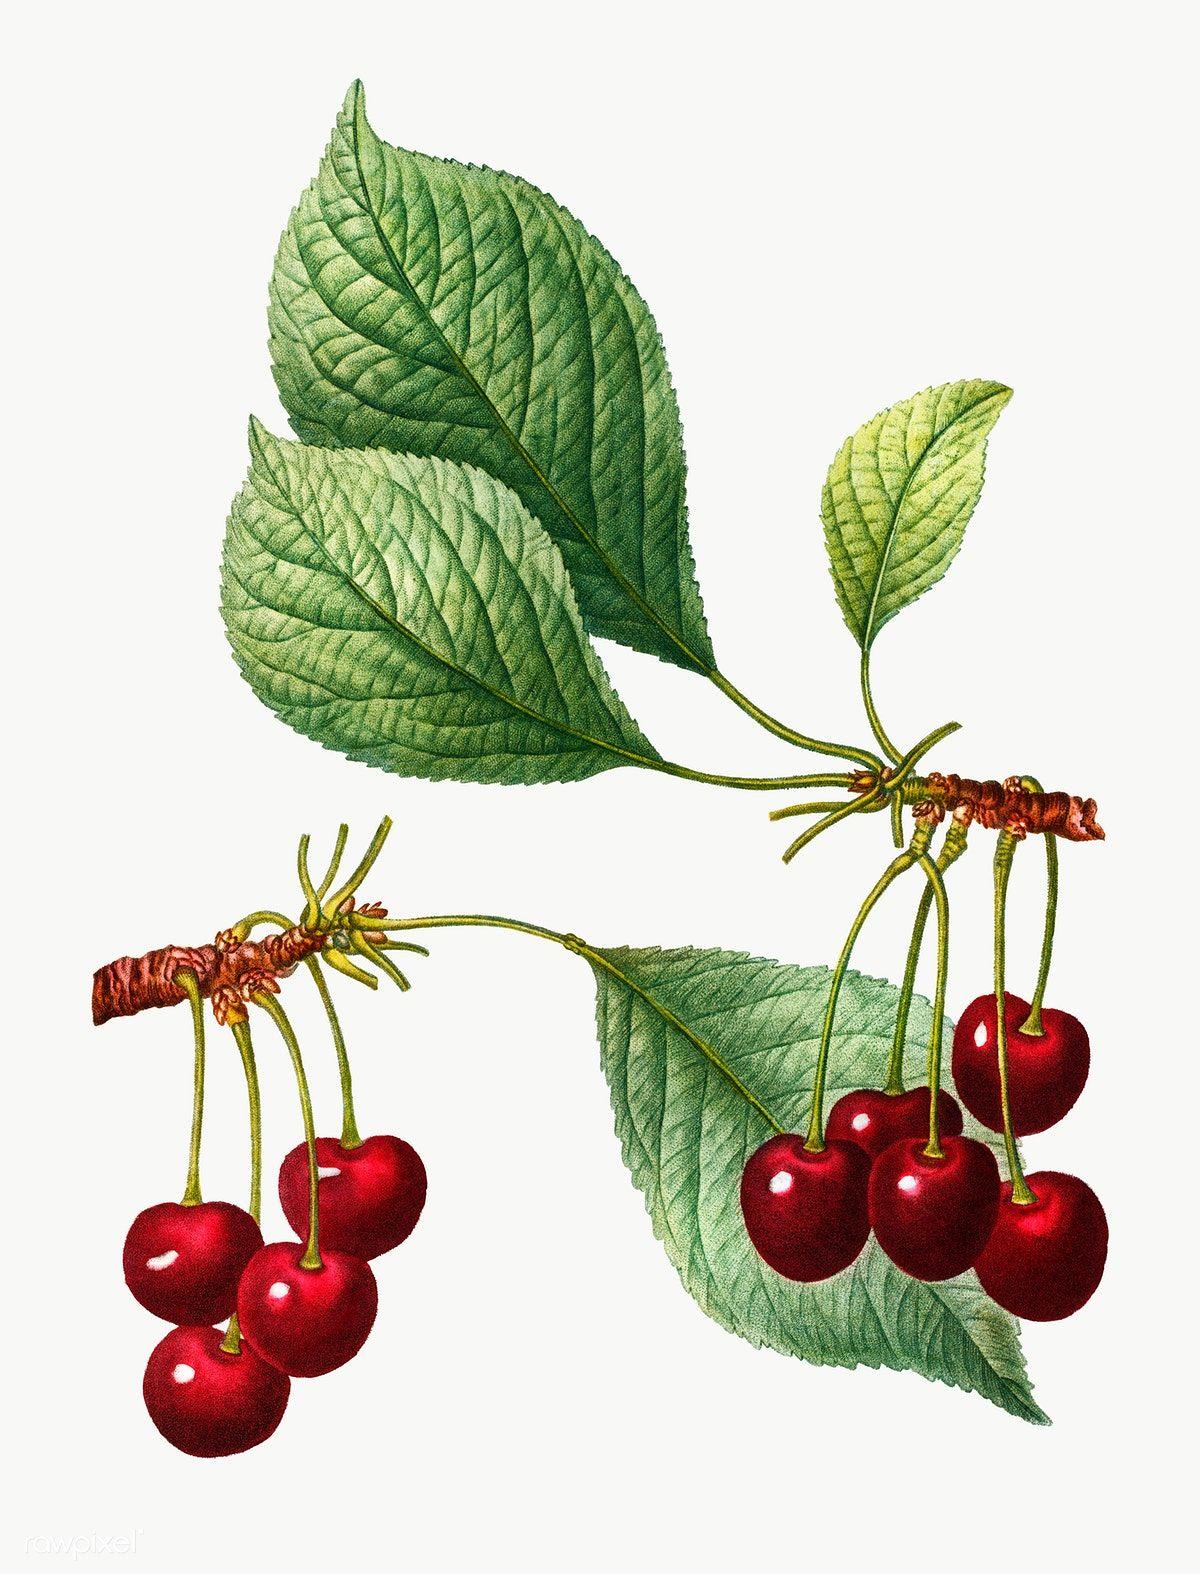 Download Premium Png Of Cherry Fruit Tree Transparent Png 568873 Cherry Tree Cherry Fruit Tree Cherry Fruit